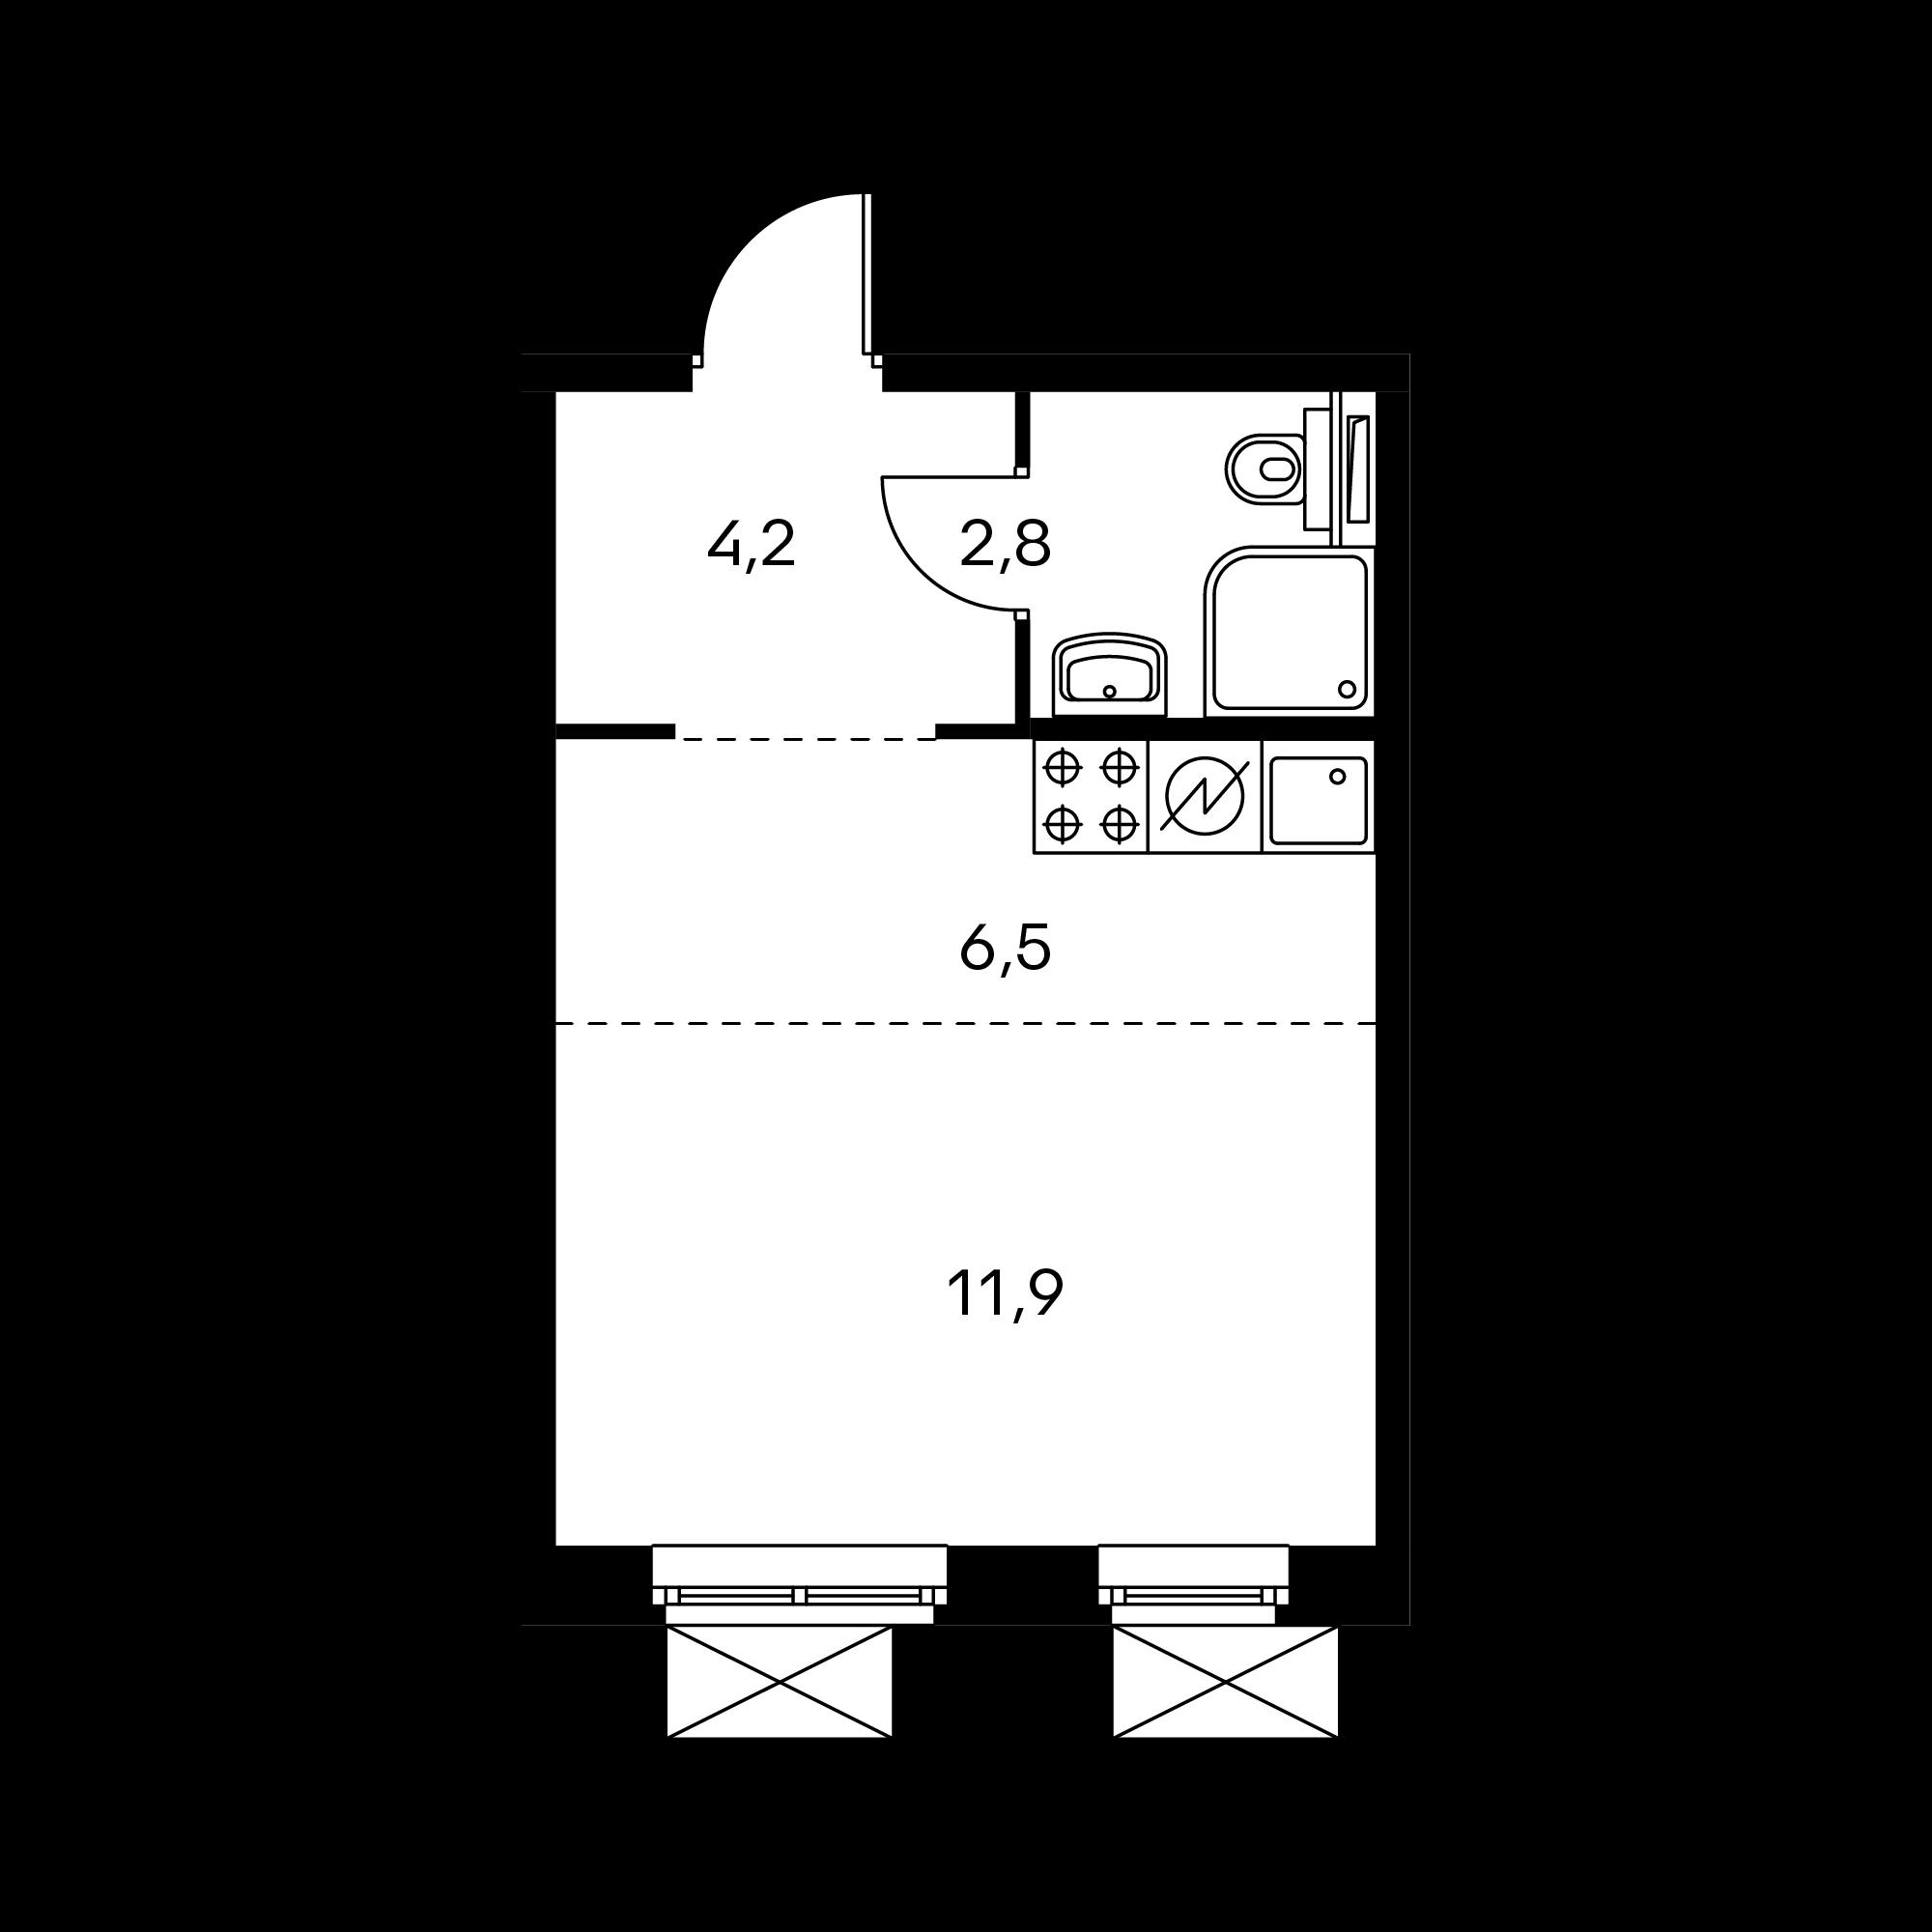 1NM1_4.5-2